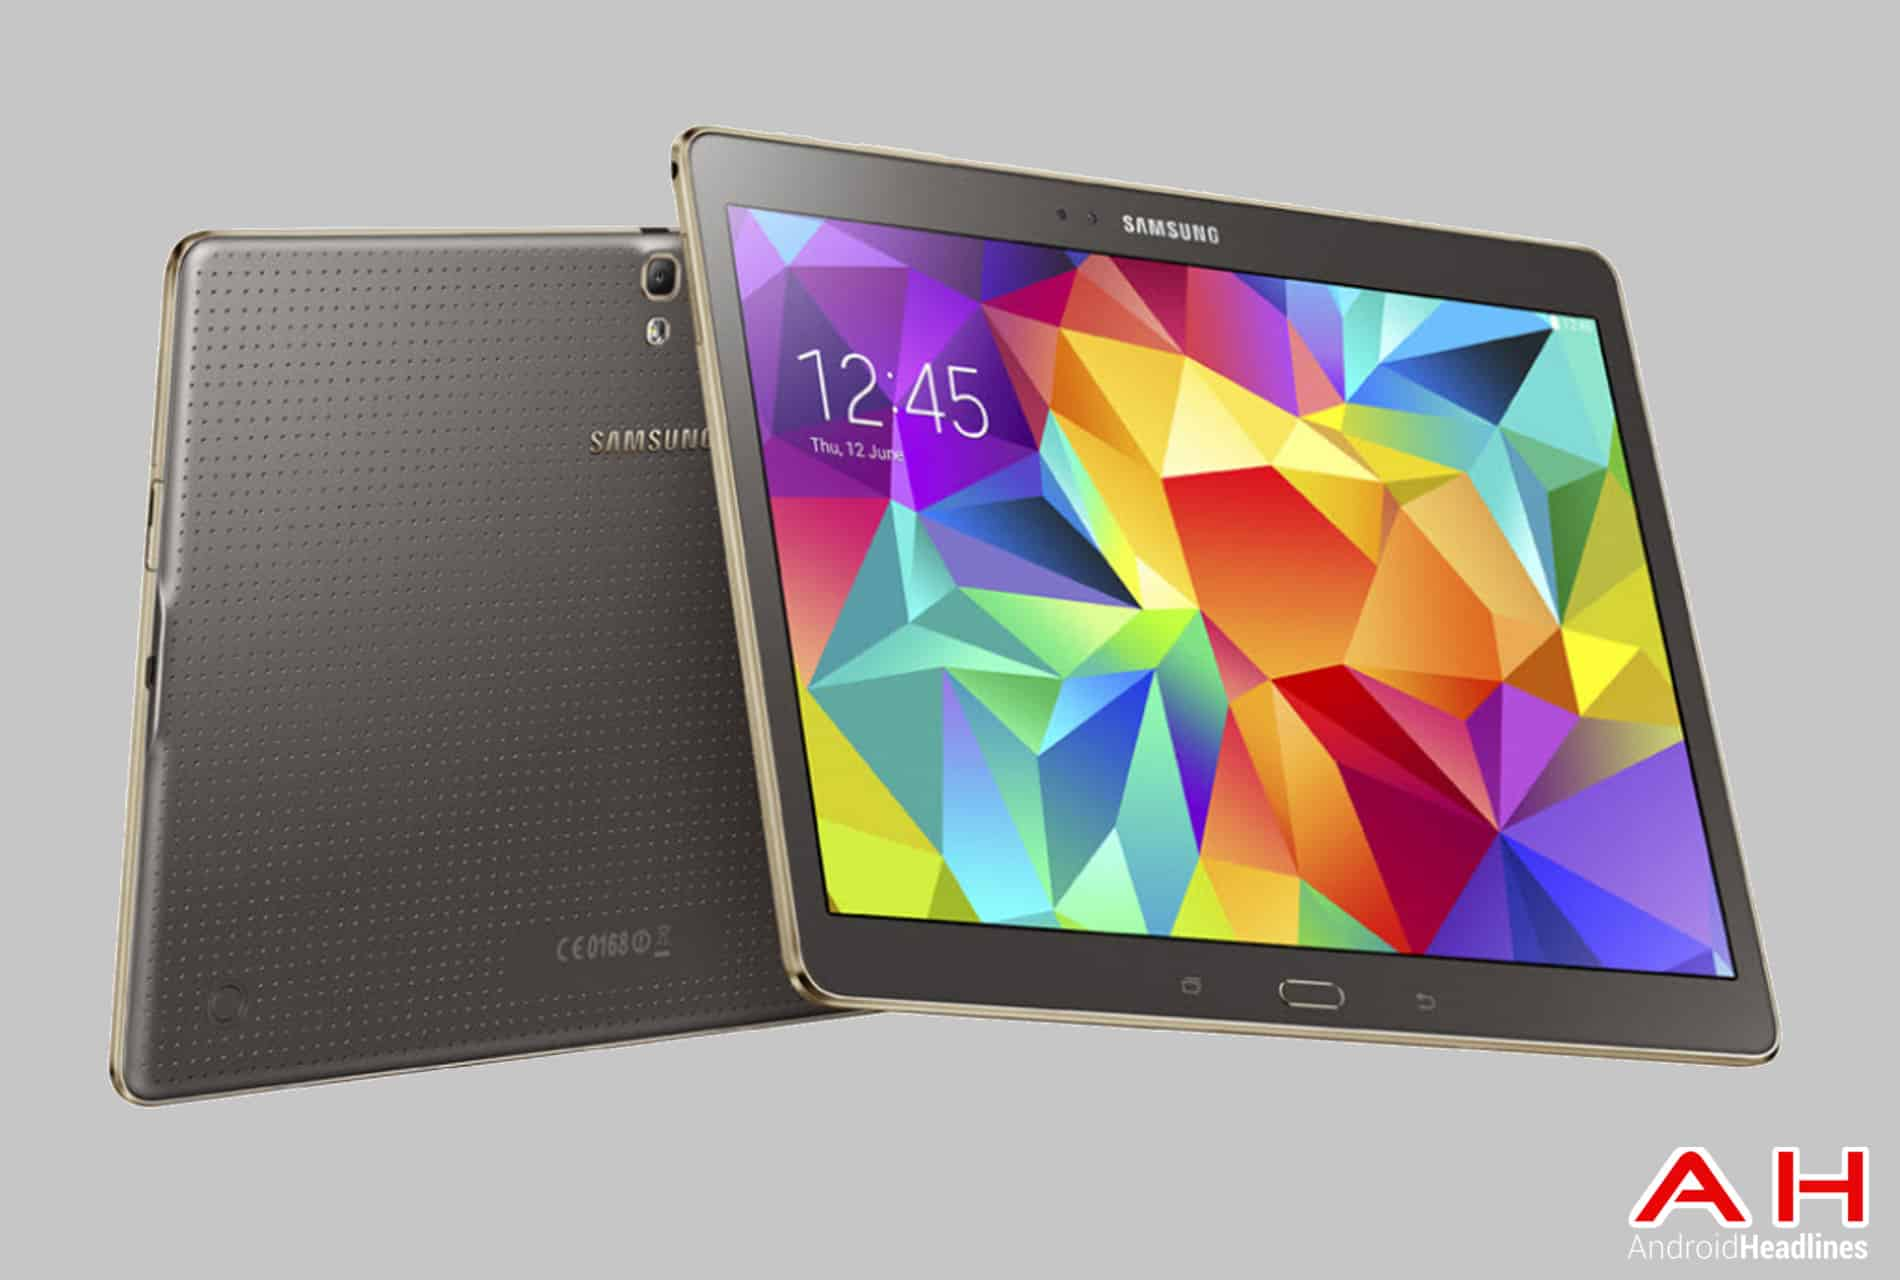 Samsung Galaxy Tab S 10.5 cam AH